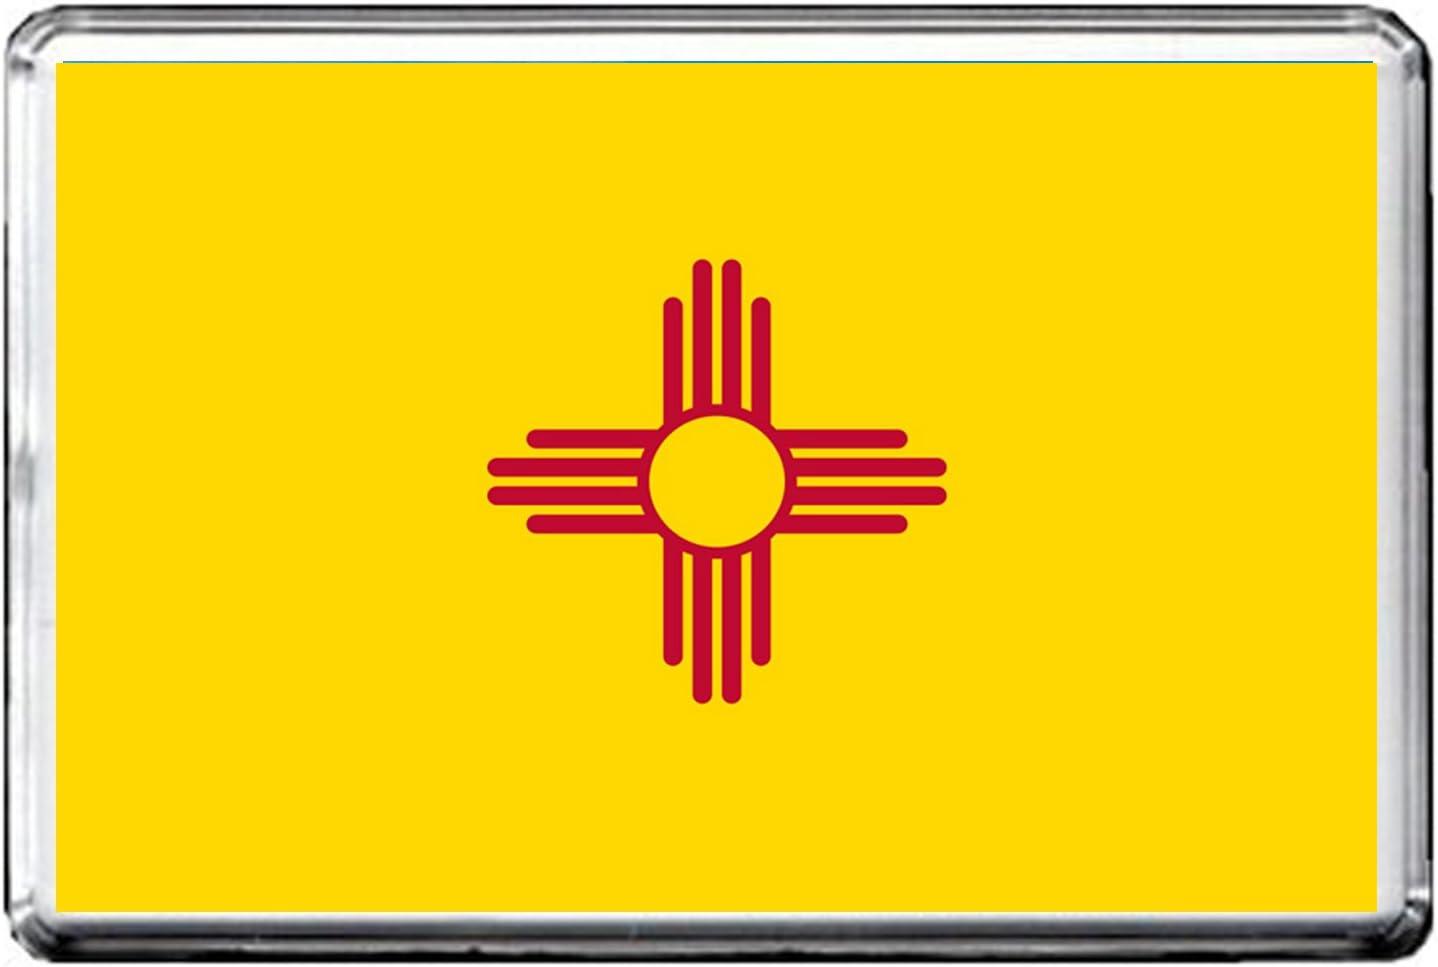 0192 NEW MEXICO FLAG FRIDGE MAGNET STATE OF USA FLAG REFRIGERATOR MAGNET